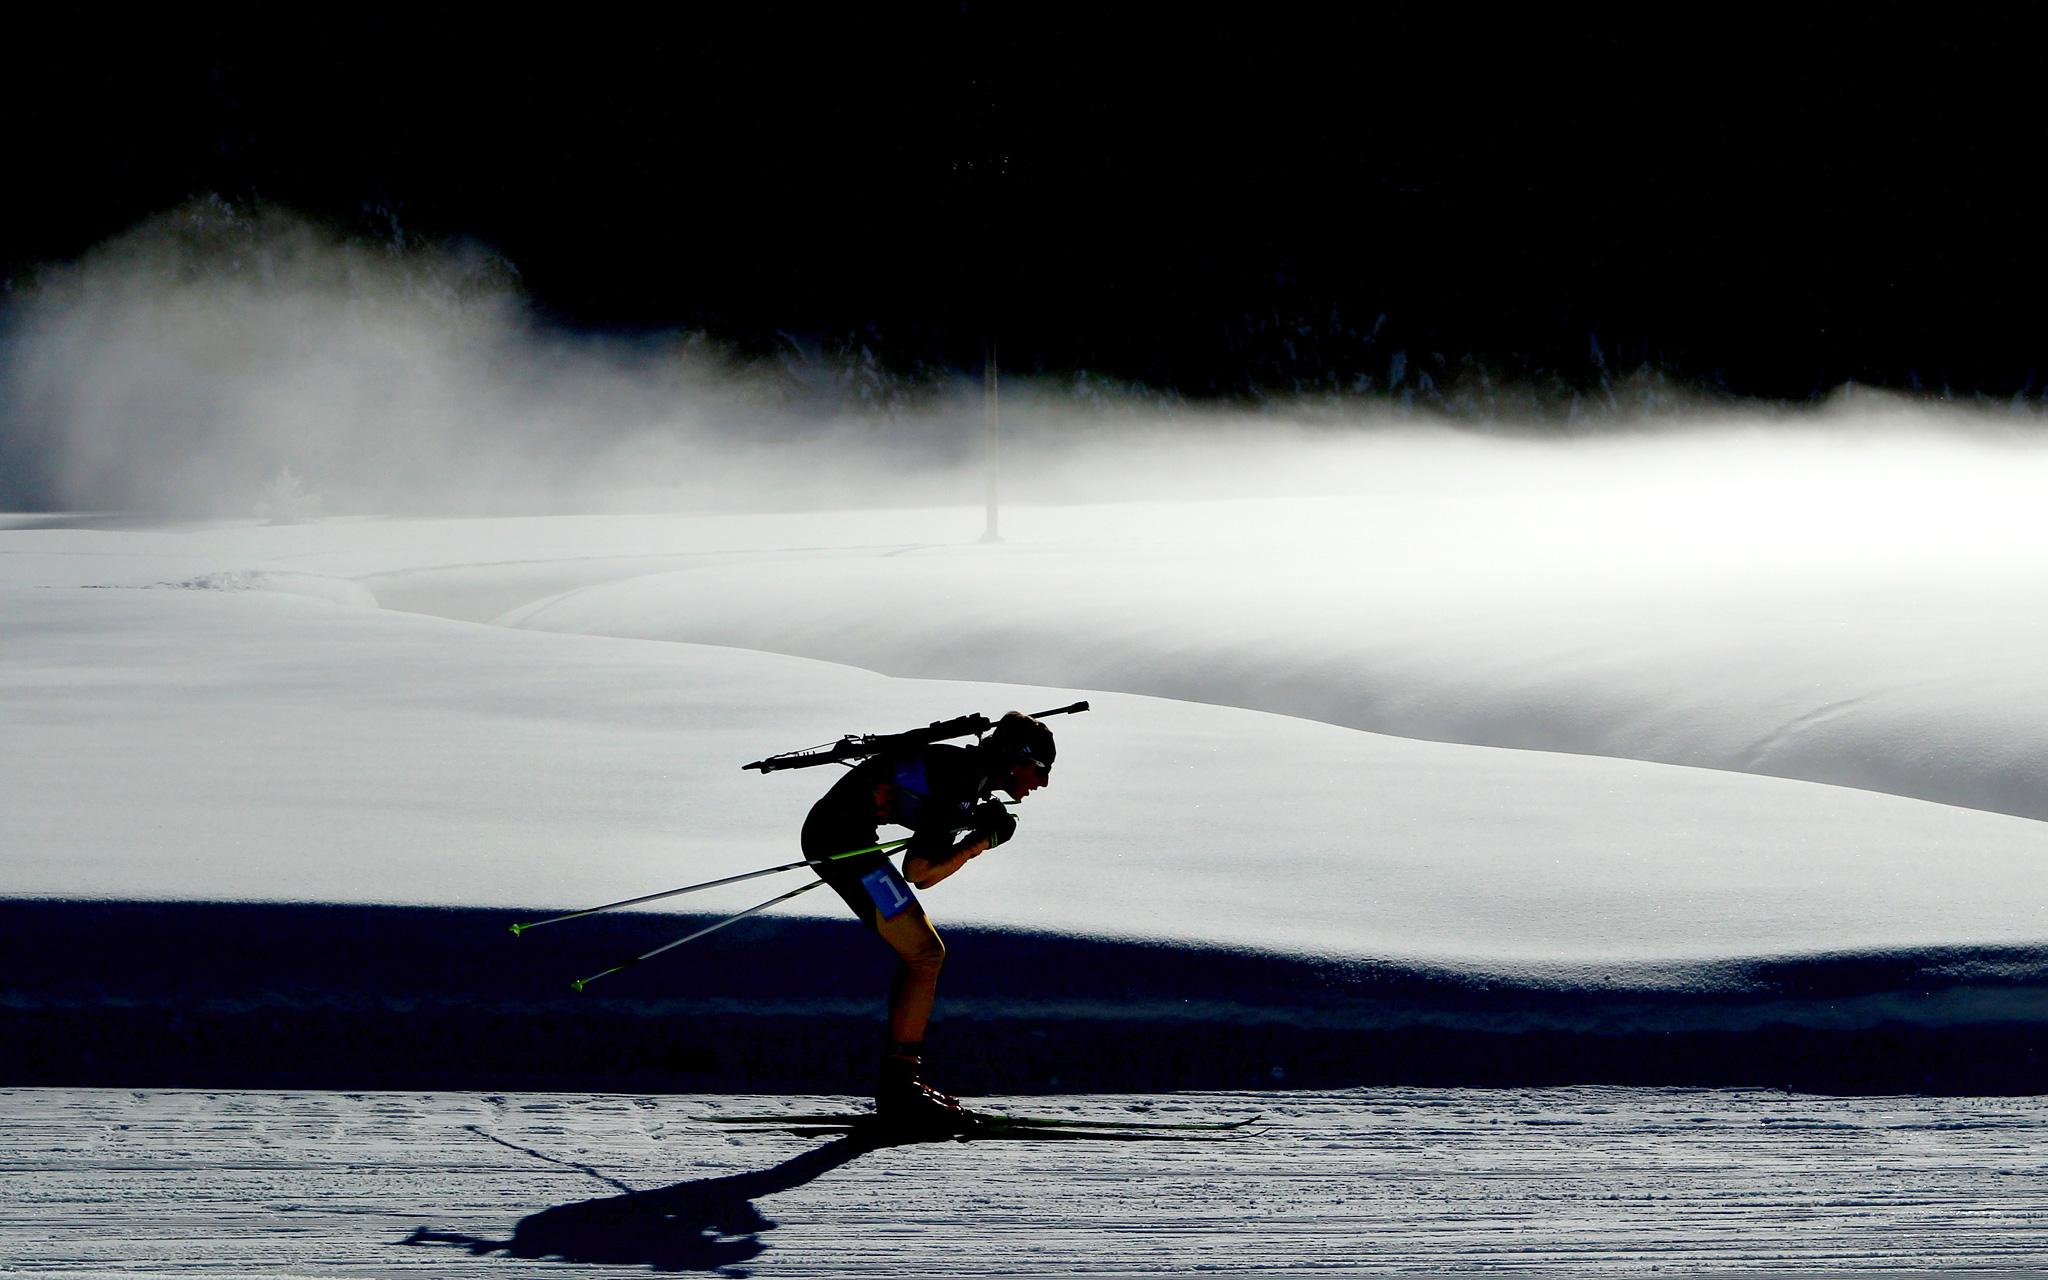 Franziska Preuss, Biathlon